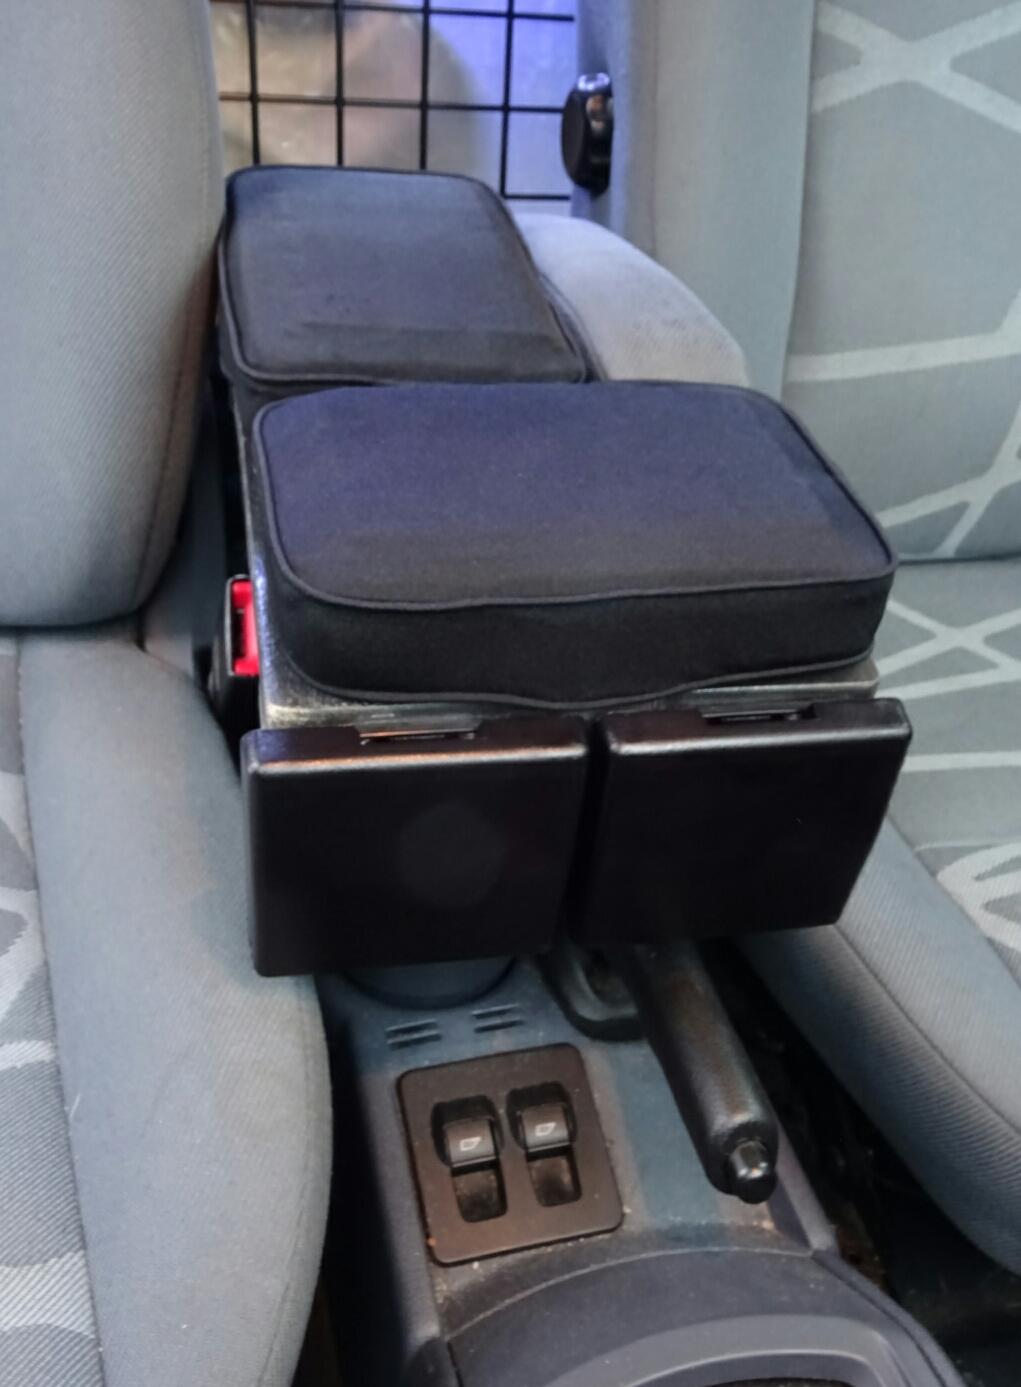 Passenger seat armrest - Interior - Ford Transit Connect Forum